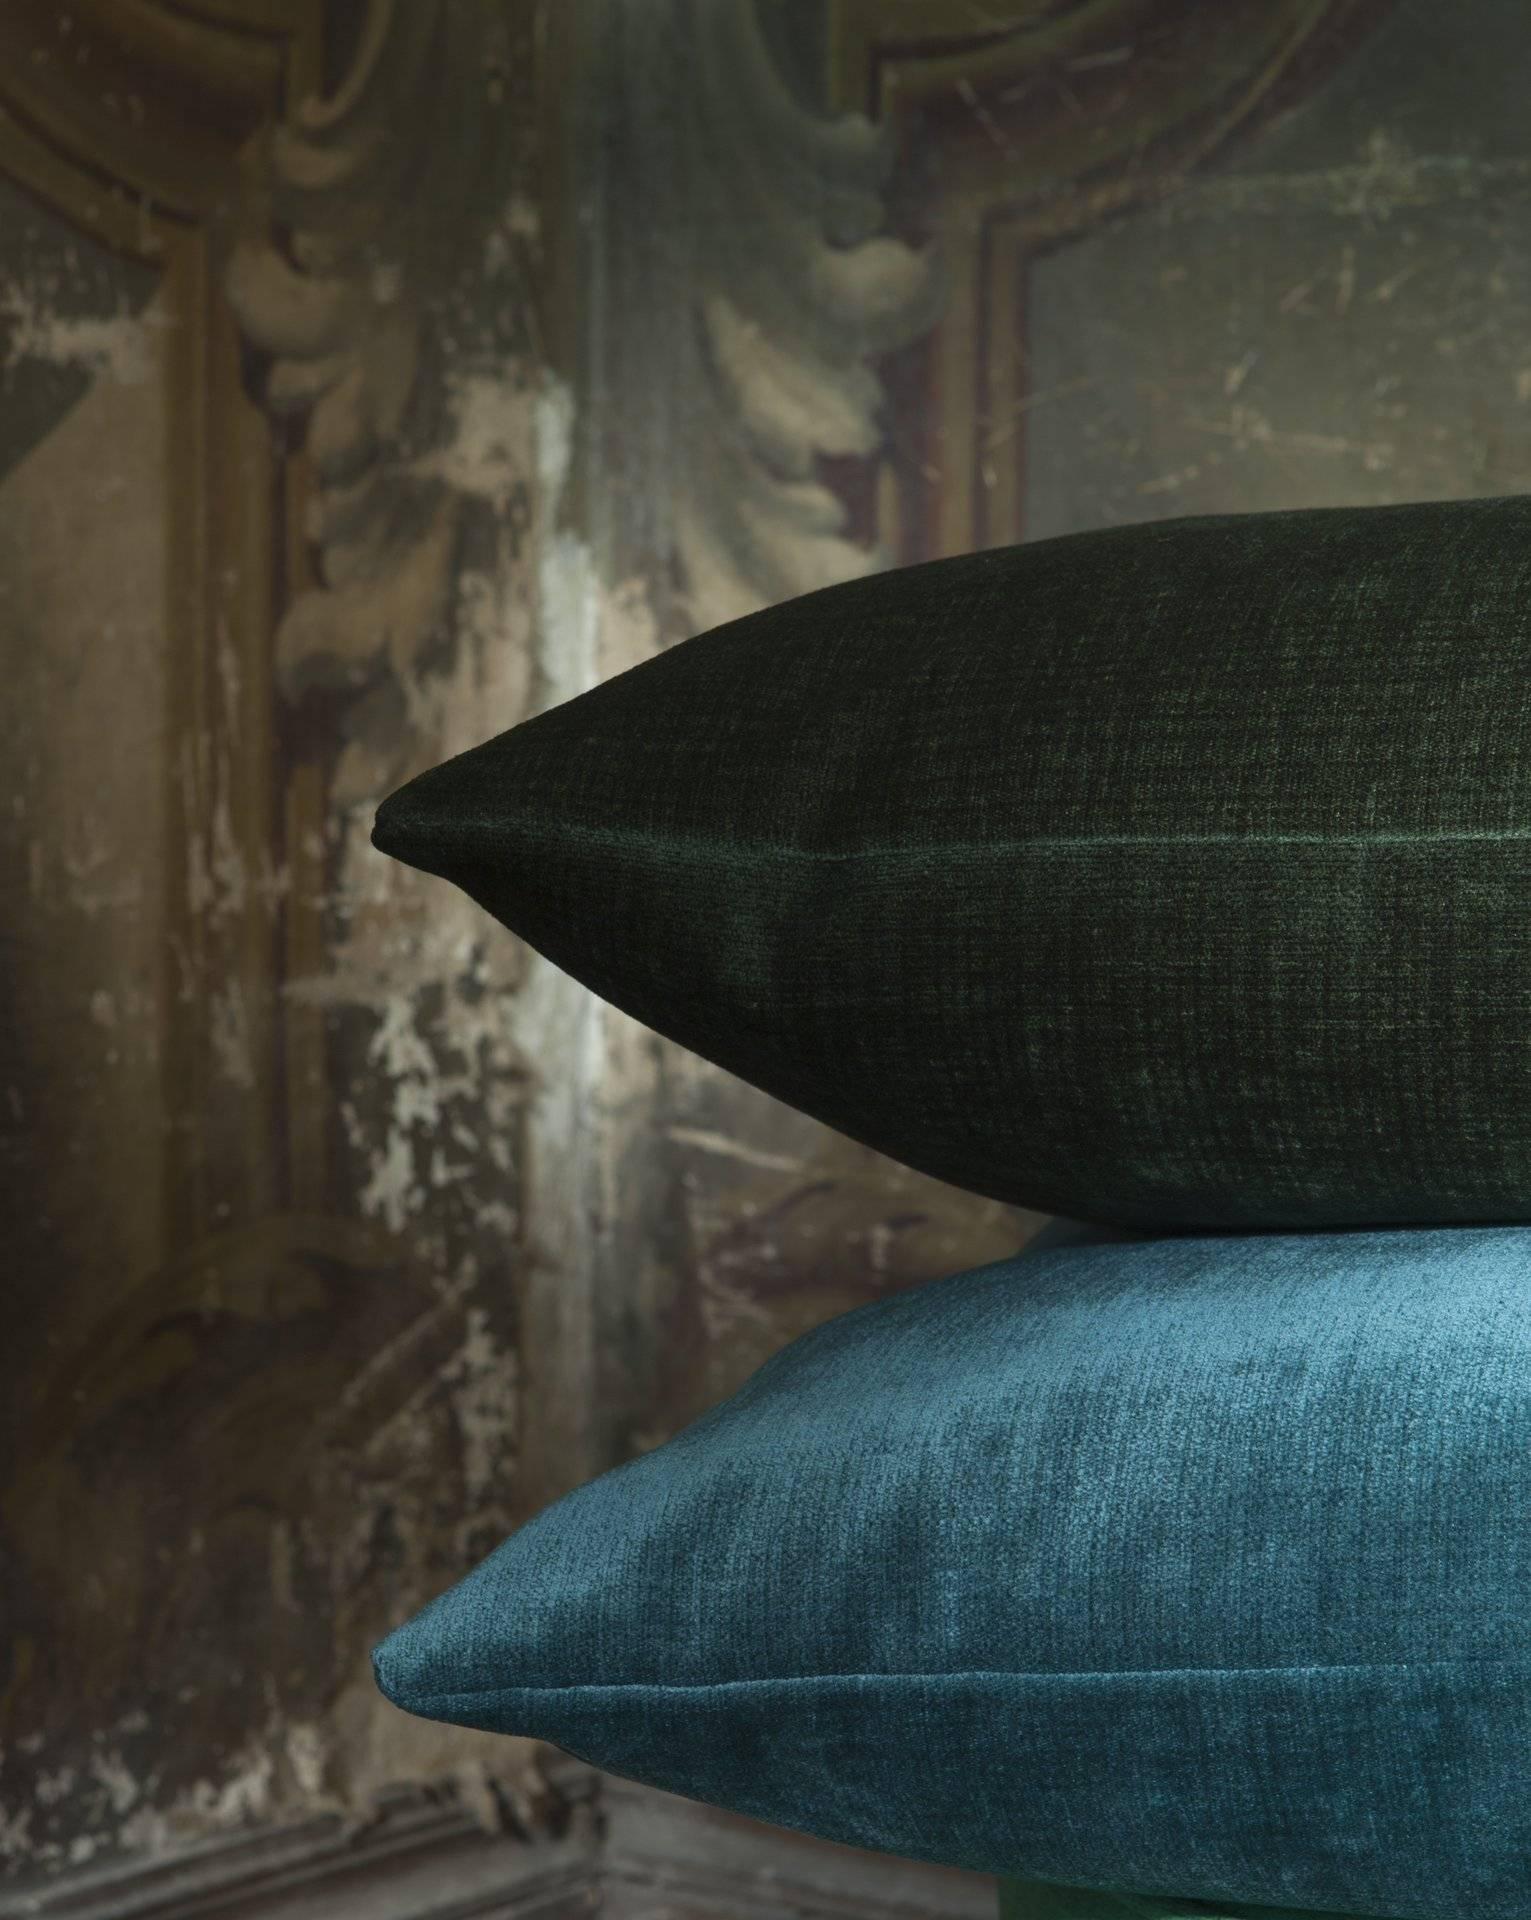 collection de tissu d 39 ameublement vivaro d coration jabd coration jab. Black Bedroom Furniture Sets. Home Design Ideas